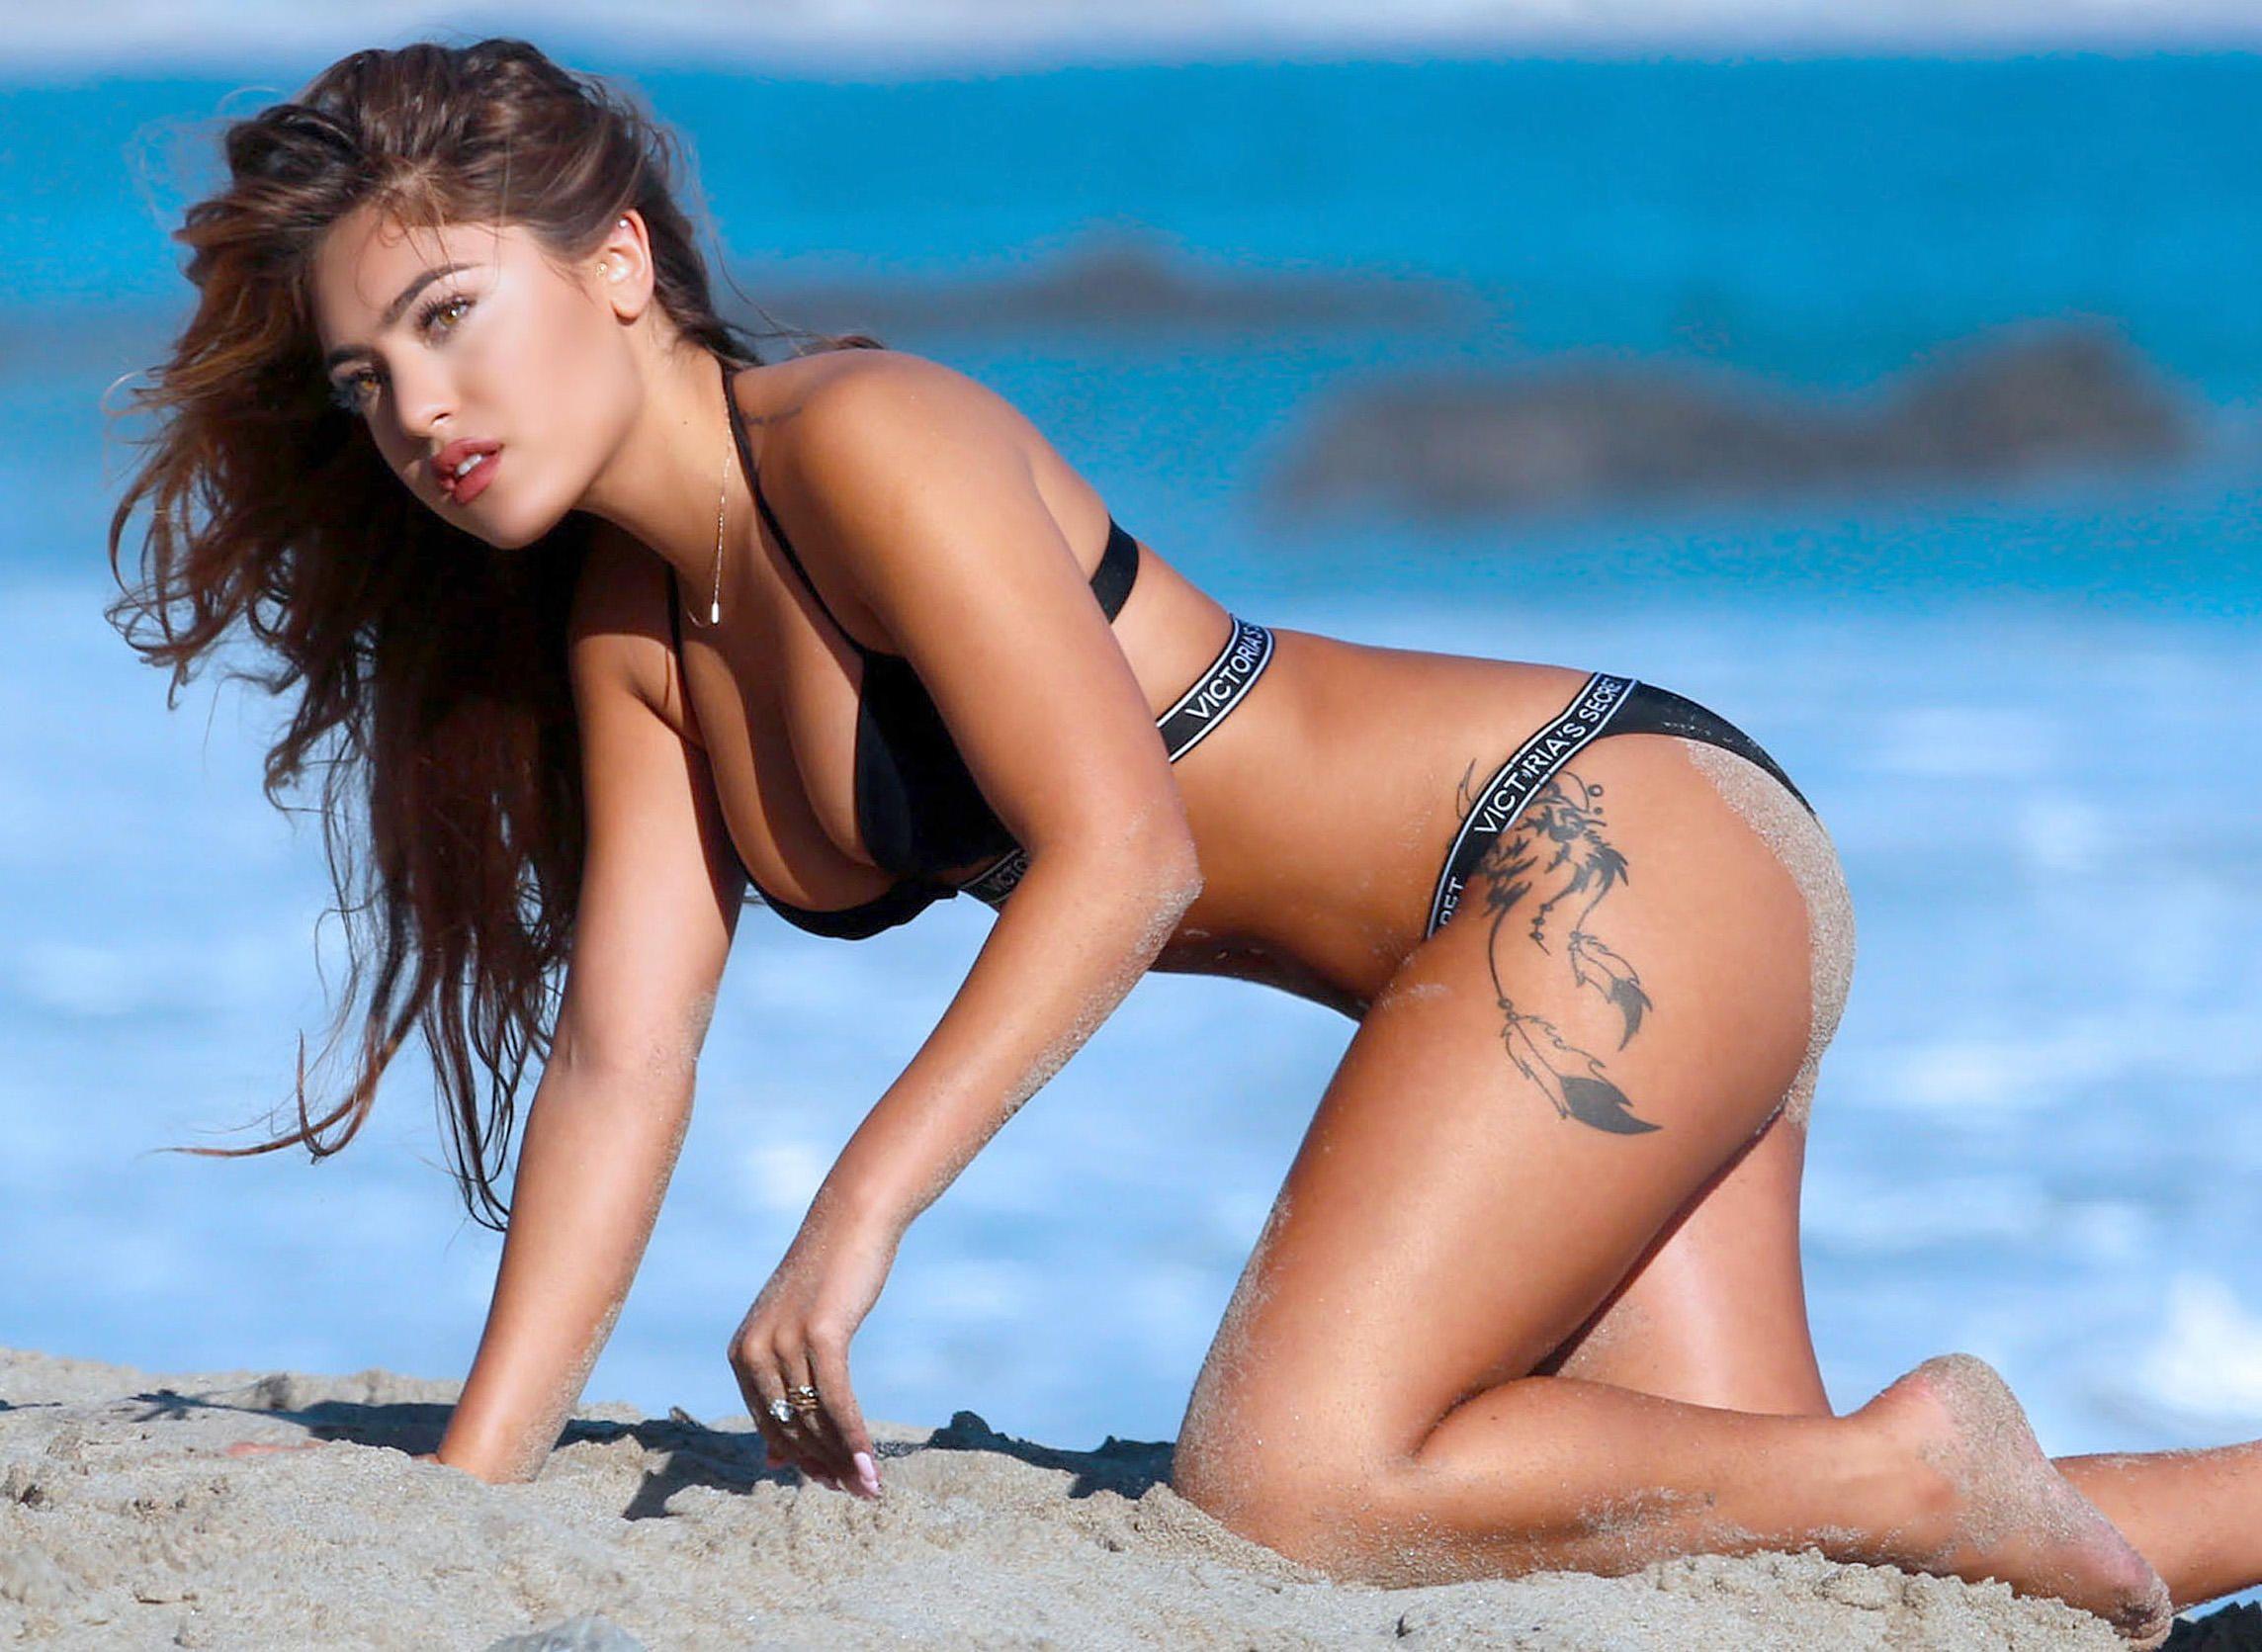 Gemma atkinson sexy pics advise